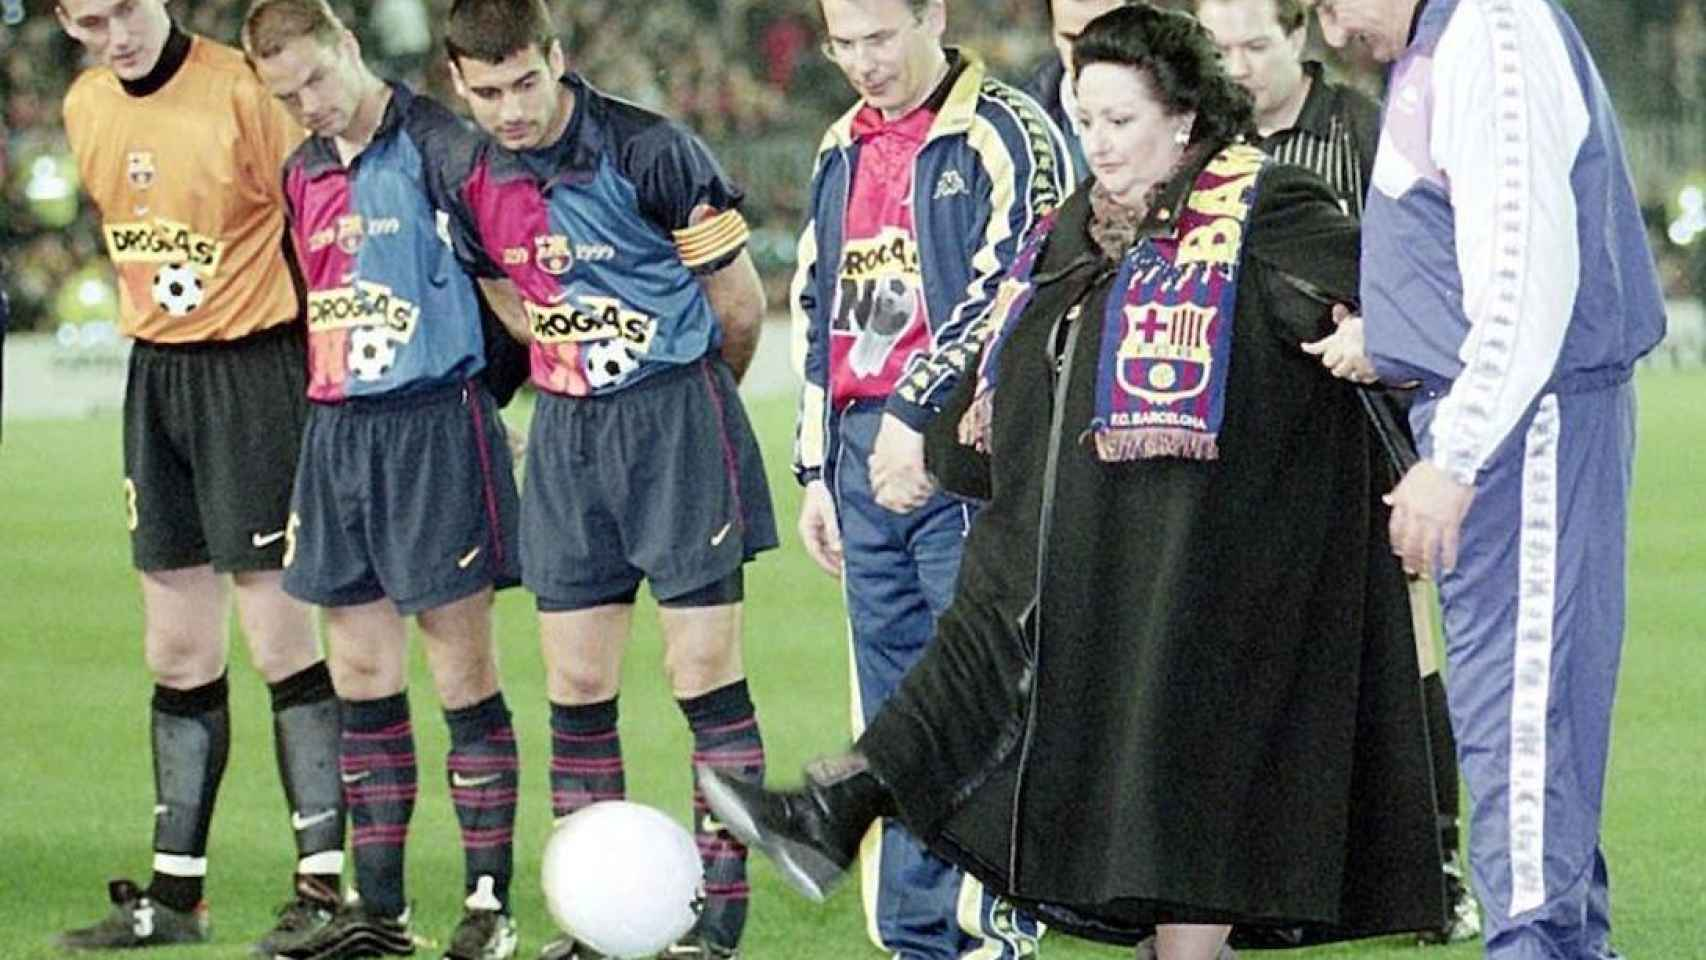 Caballé dando el saque de honor junto a Guardiola en un partido del FC Barcelona.